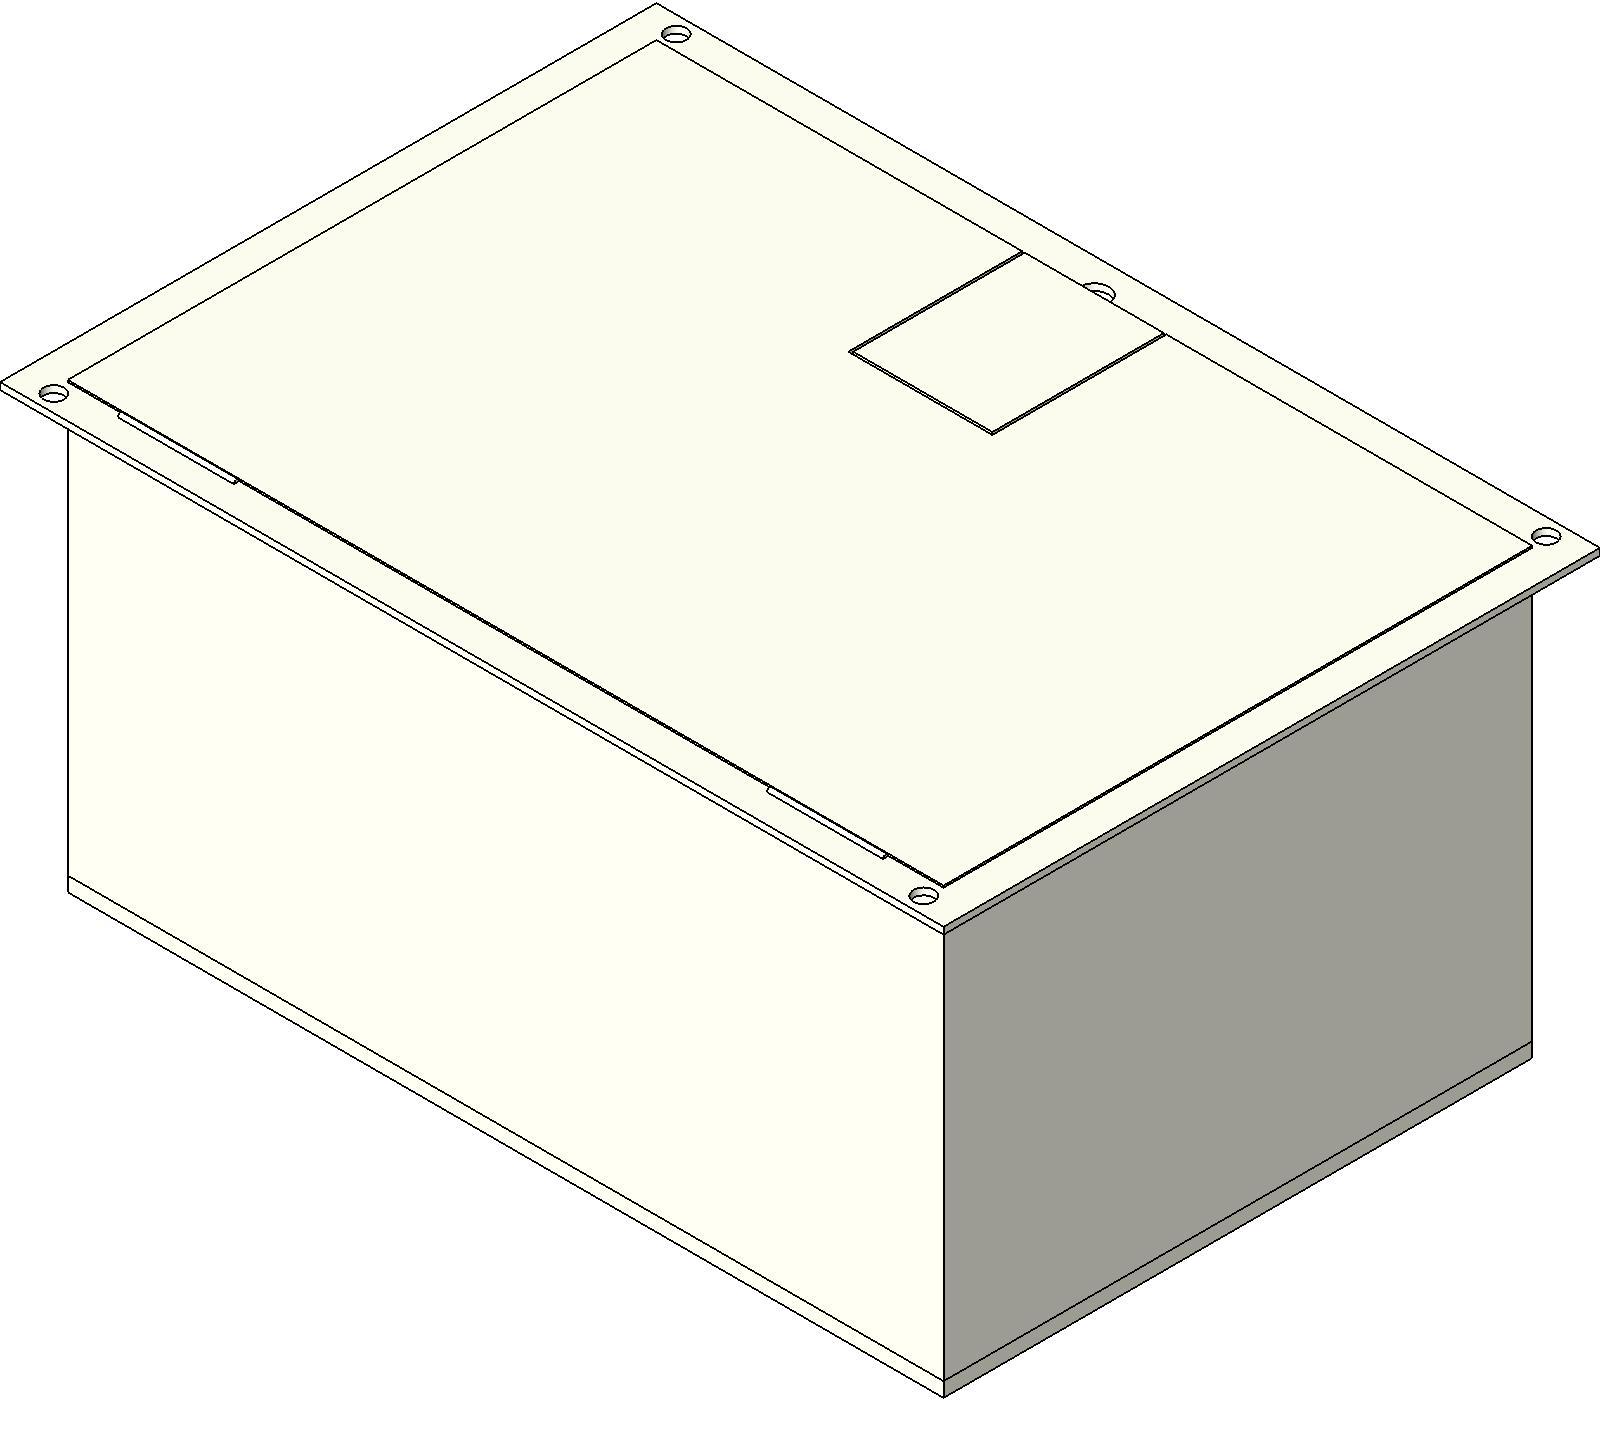 Electrical Box_FSR_FL1500 2D bim objects families electrical devices electrical boxes  at eliteediting.co